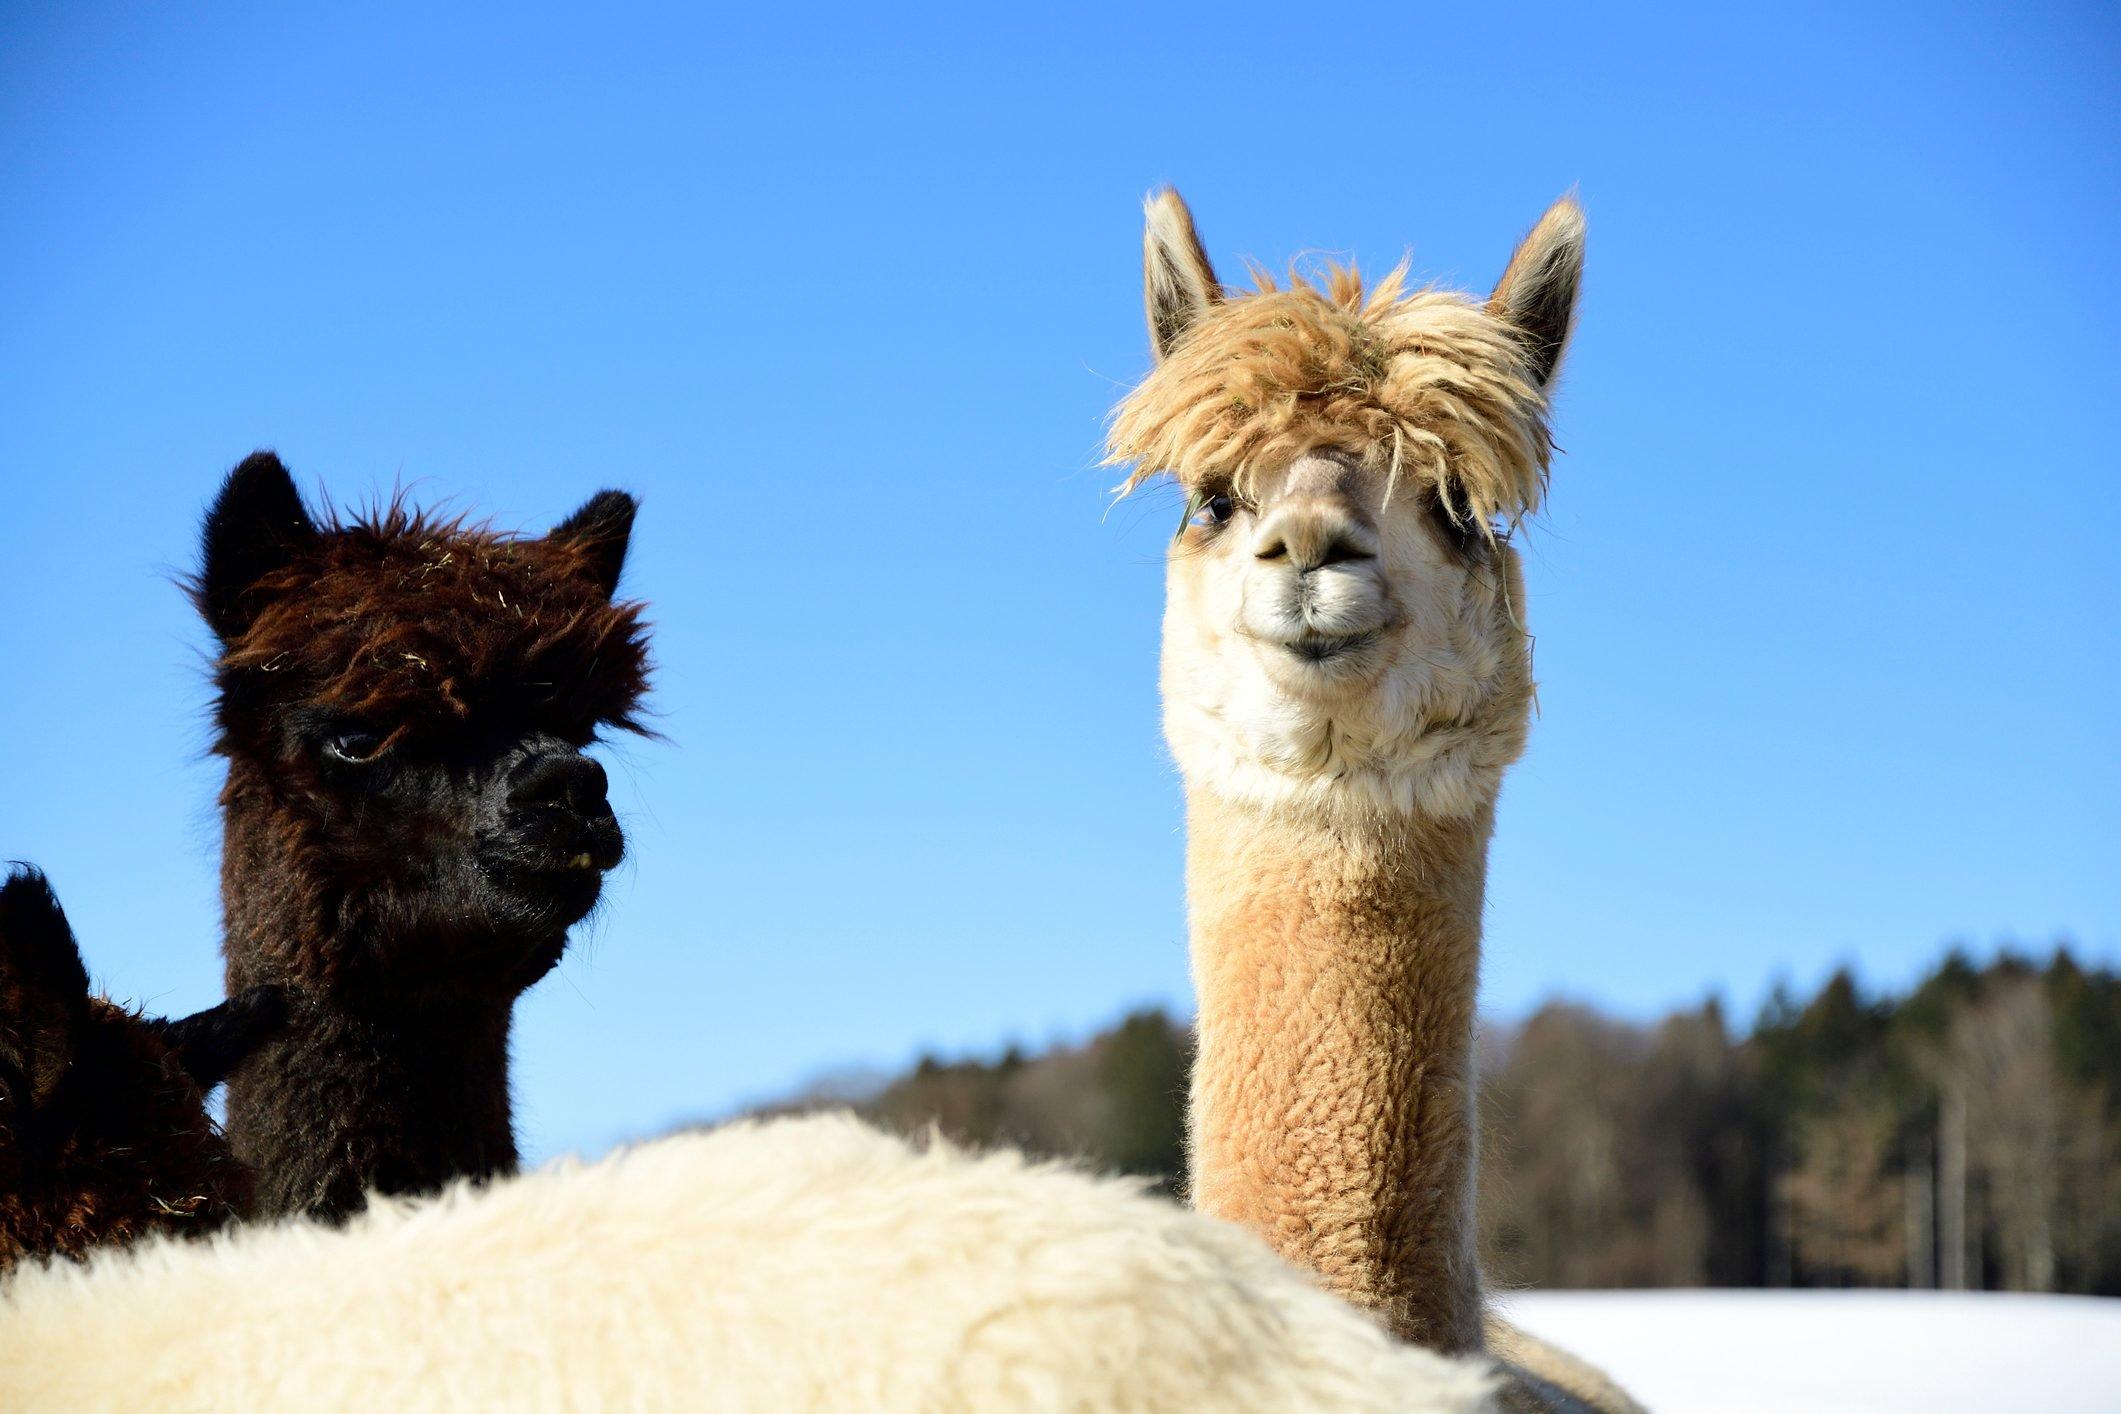 Portrait of two alpacas outdoors in winter